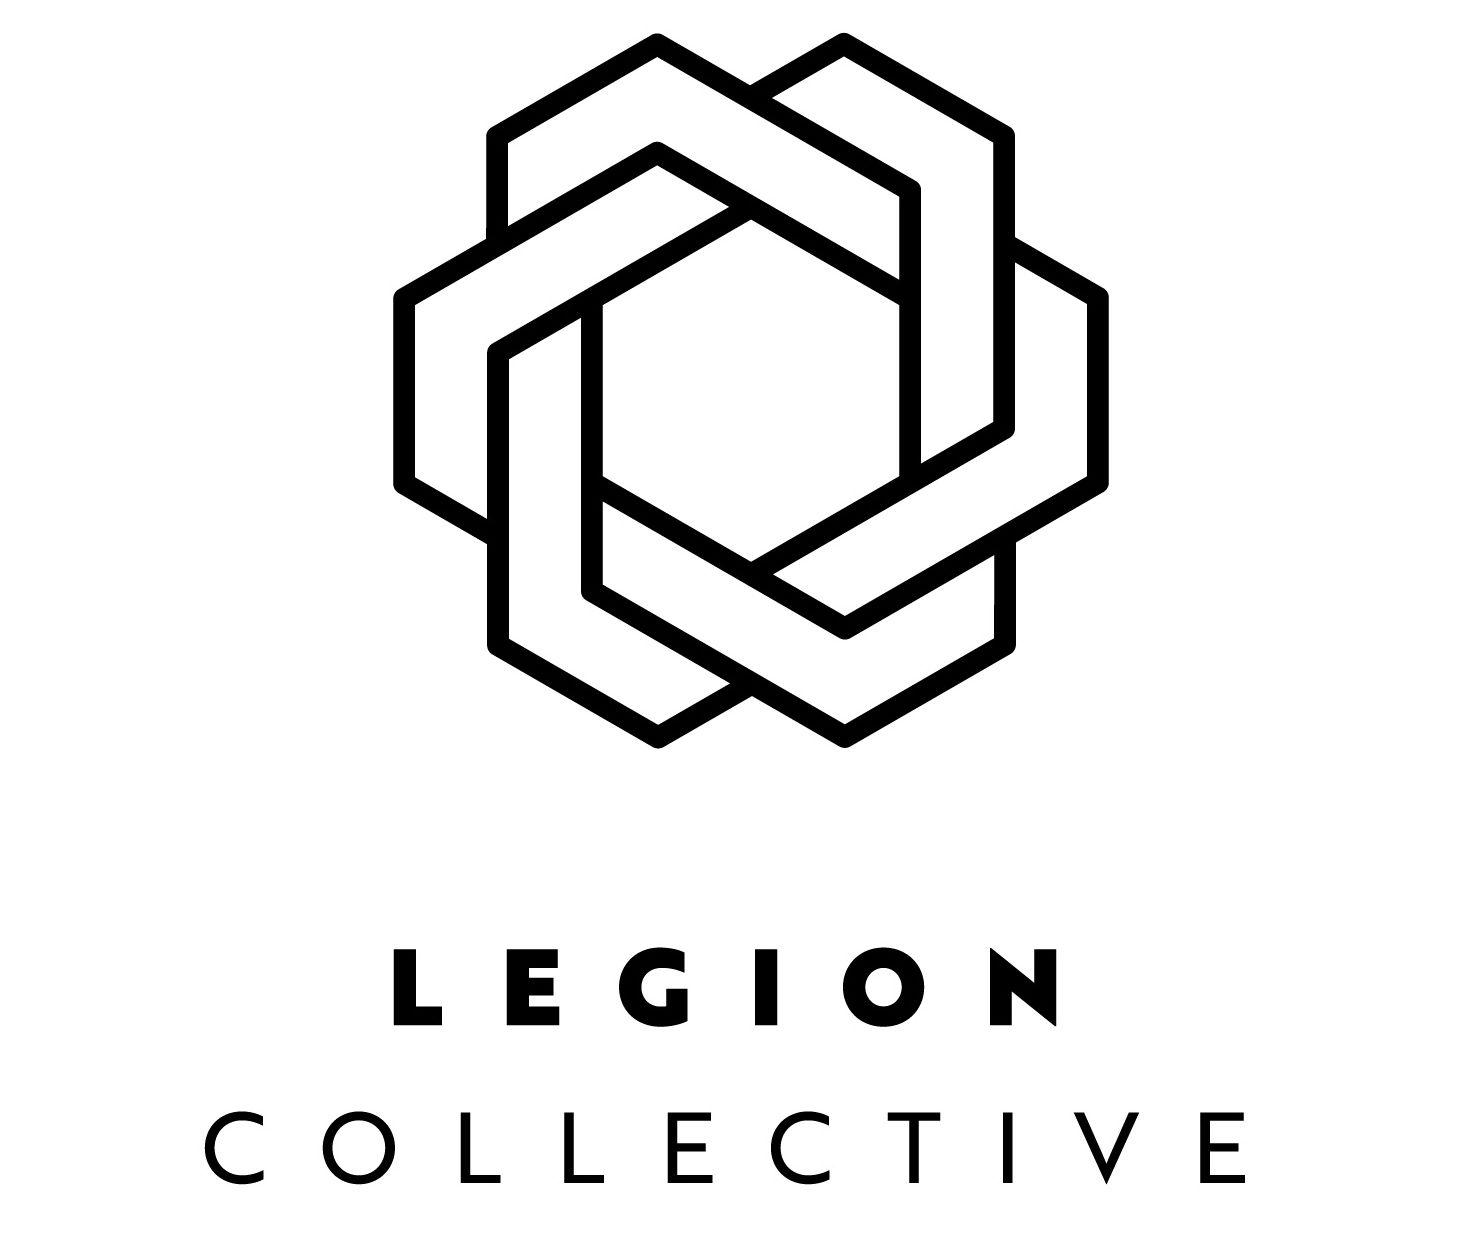 https://legioncollective.com/#1